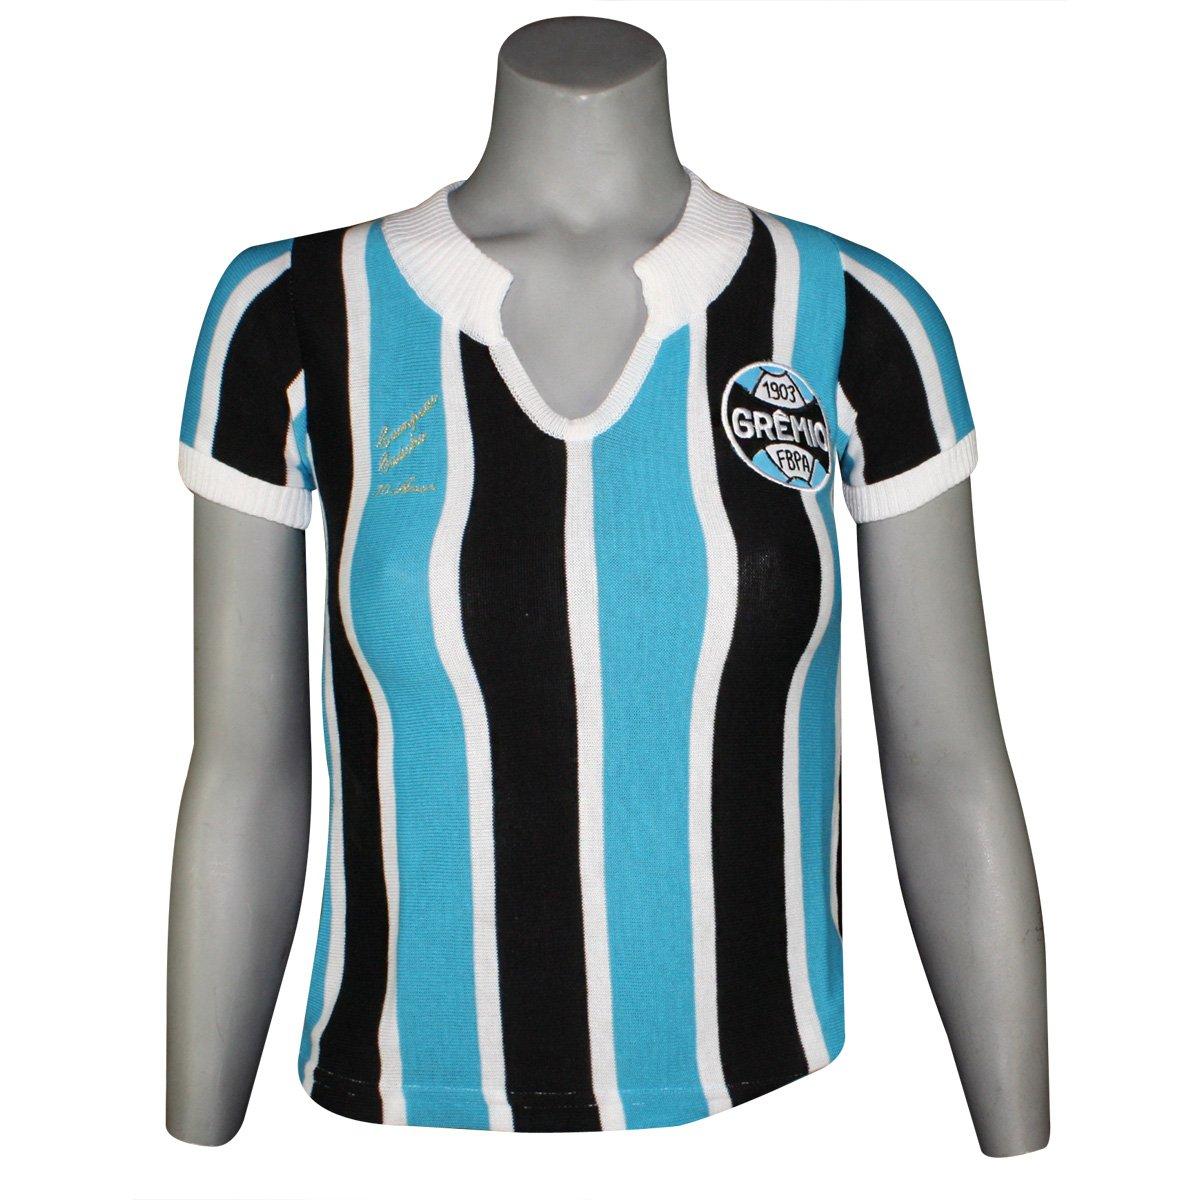 df13beca9 Camisa Feminina Dilva Oldoni Grêmio Retro Replica G35 Tricolor